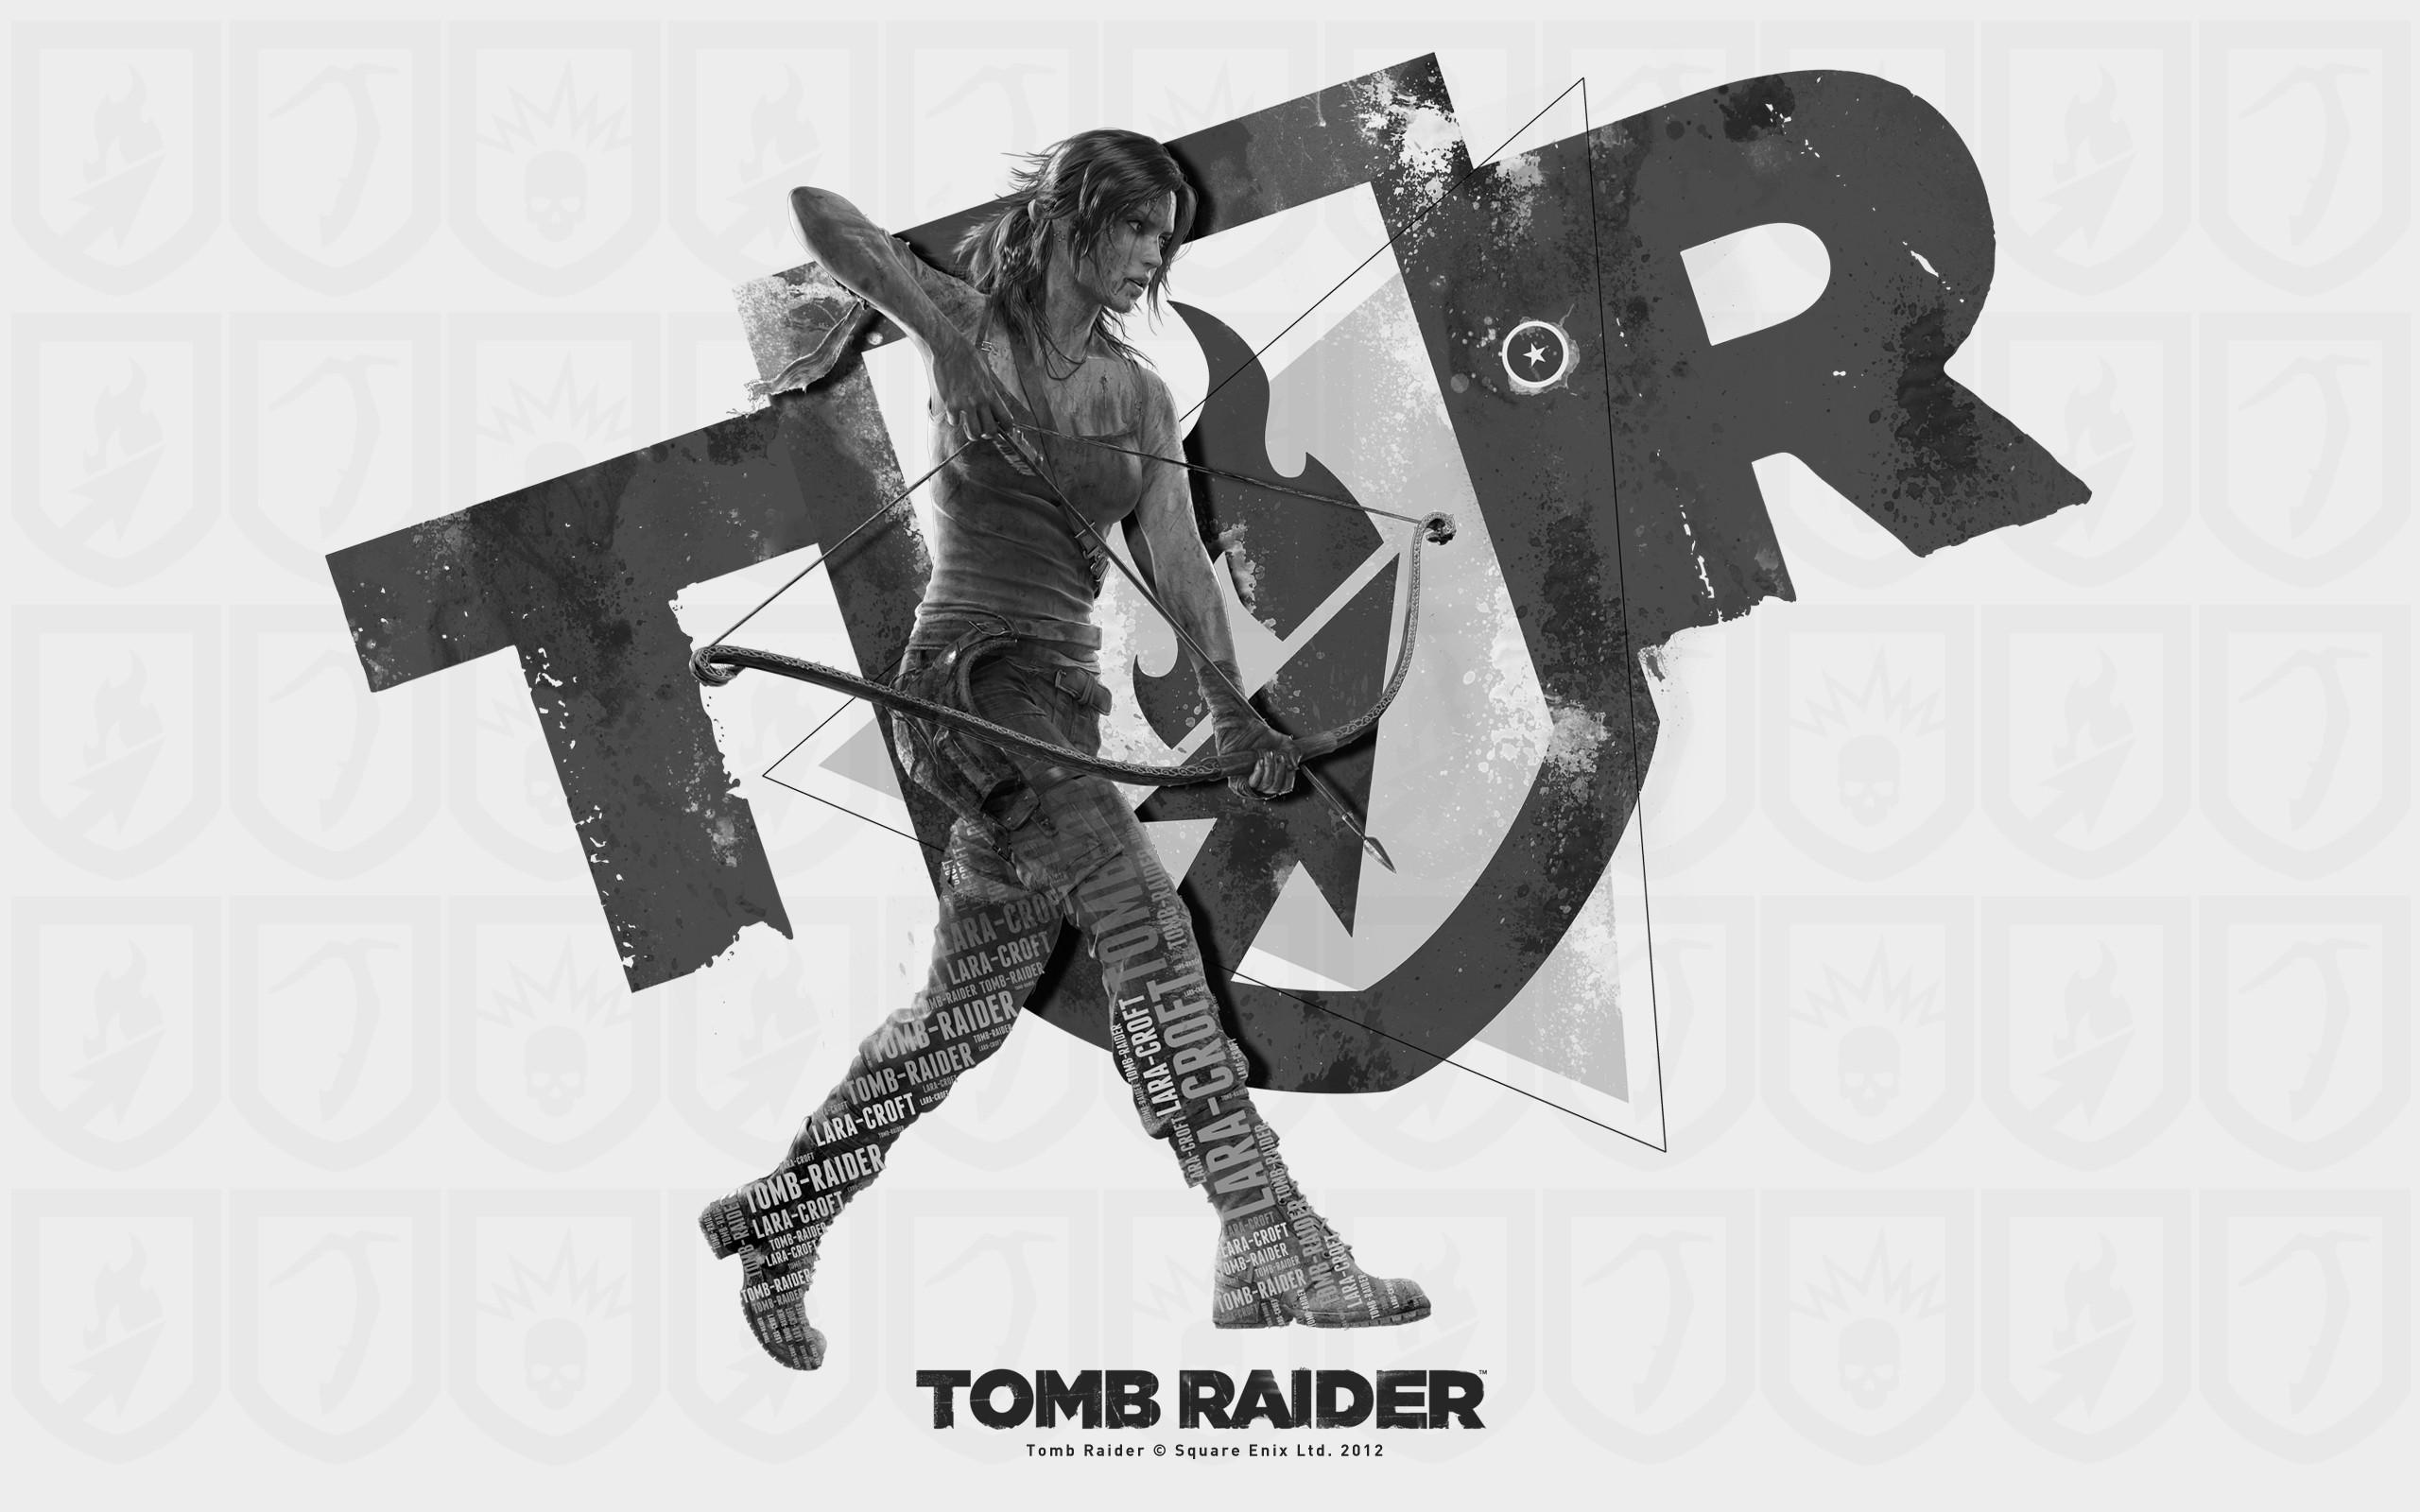 Lara Croft en Tomb Raider - 2560x1600